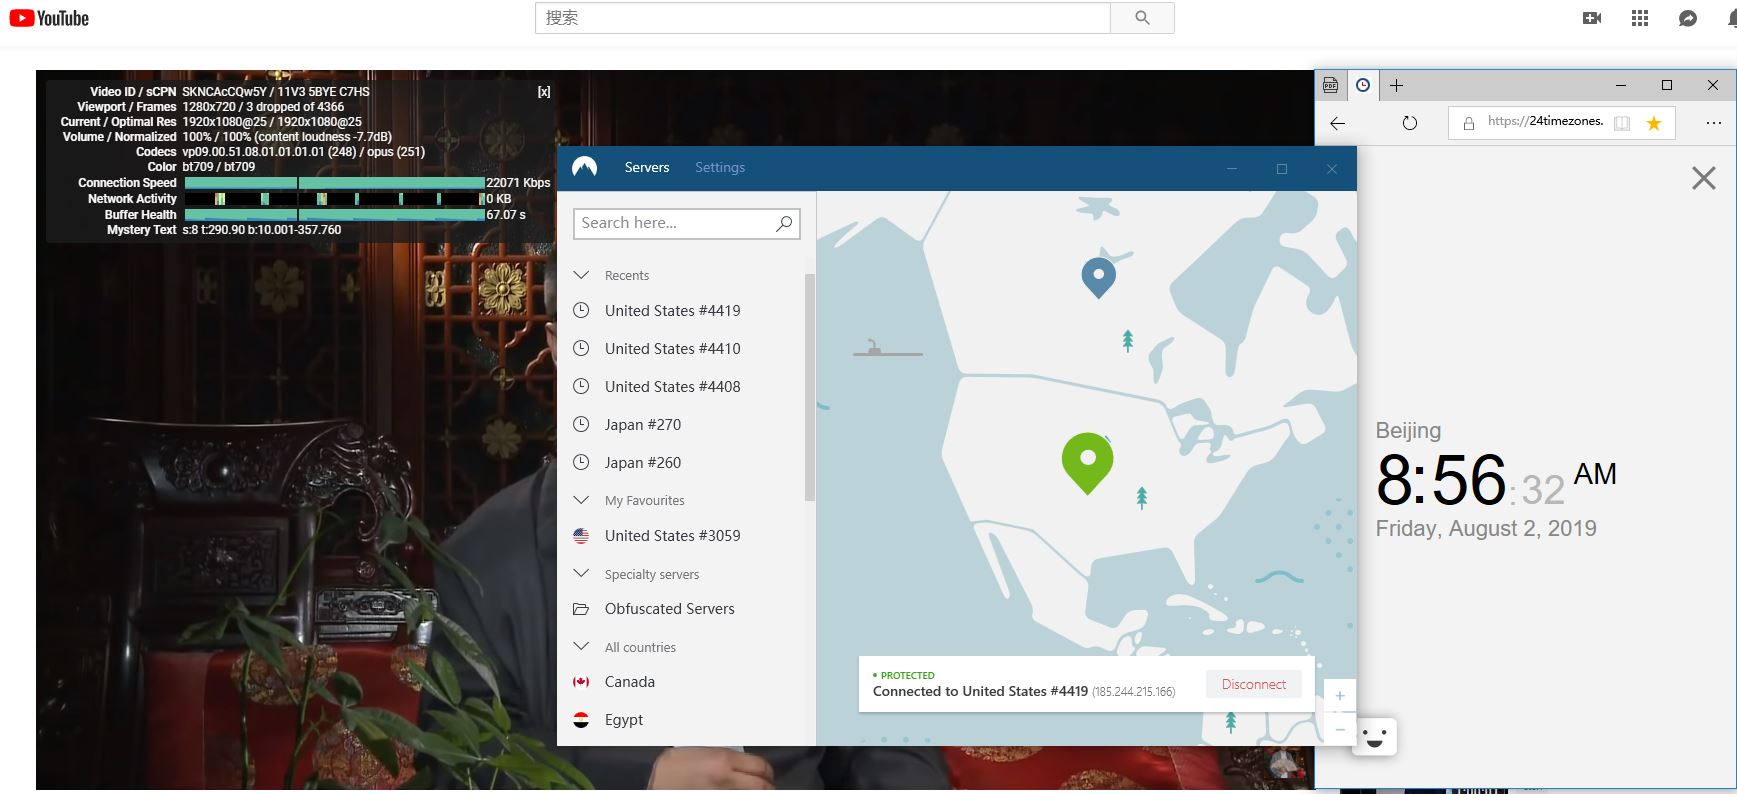 windows nordvpn UDP协议 美国4419服务器 翻墙 科学上网 YouTube速度-20190802